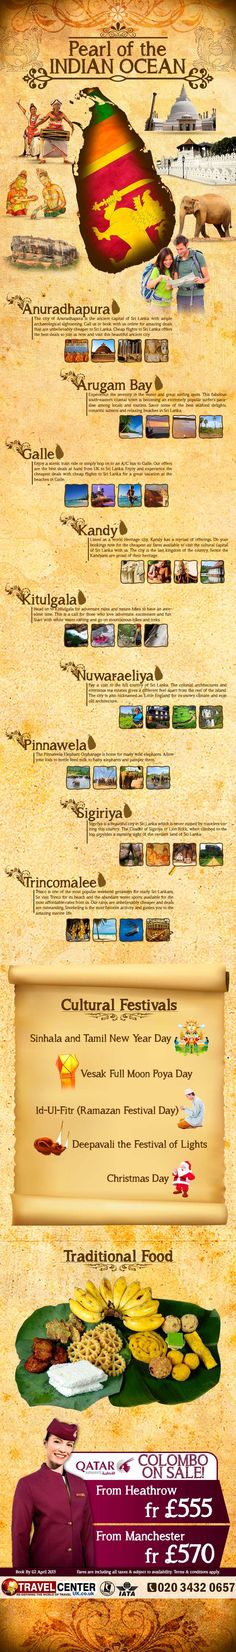 pearl-of-the-india-ocean-sri-lanka-travel-infographics_51665adf355c9.jpg (900×6300)